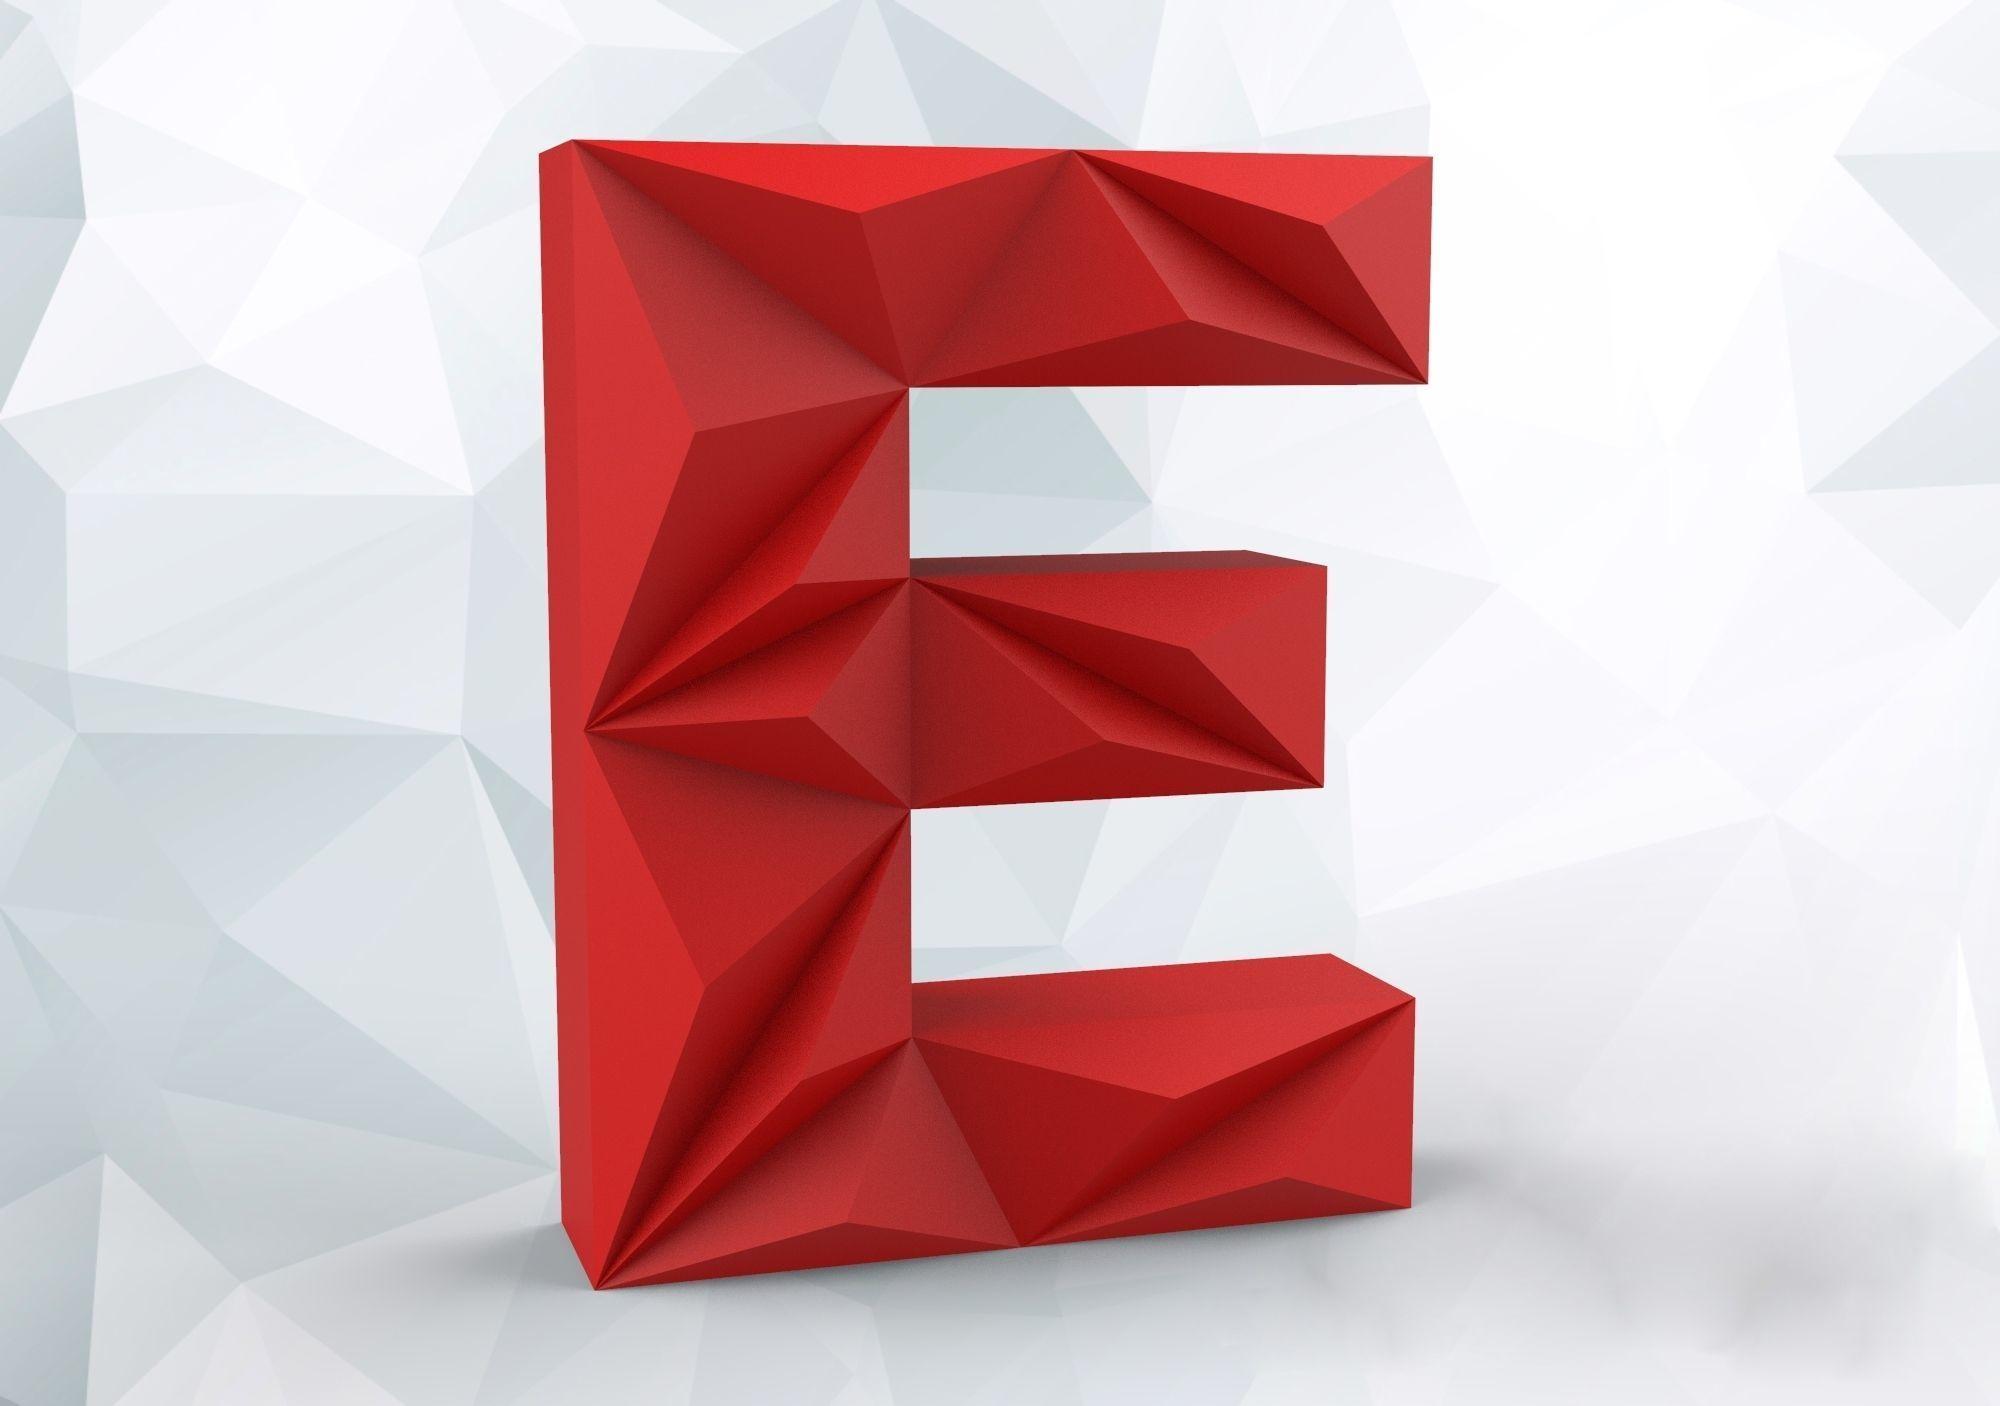 Lowpoly letter E